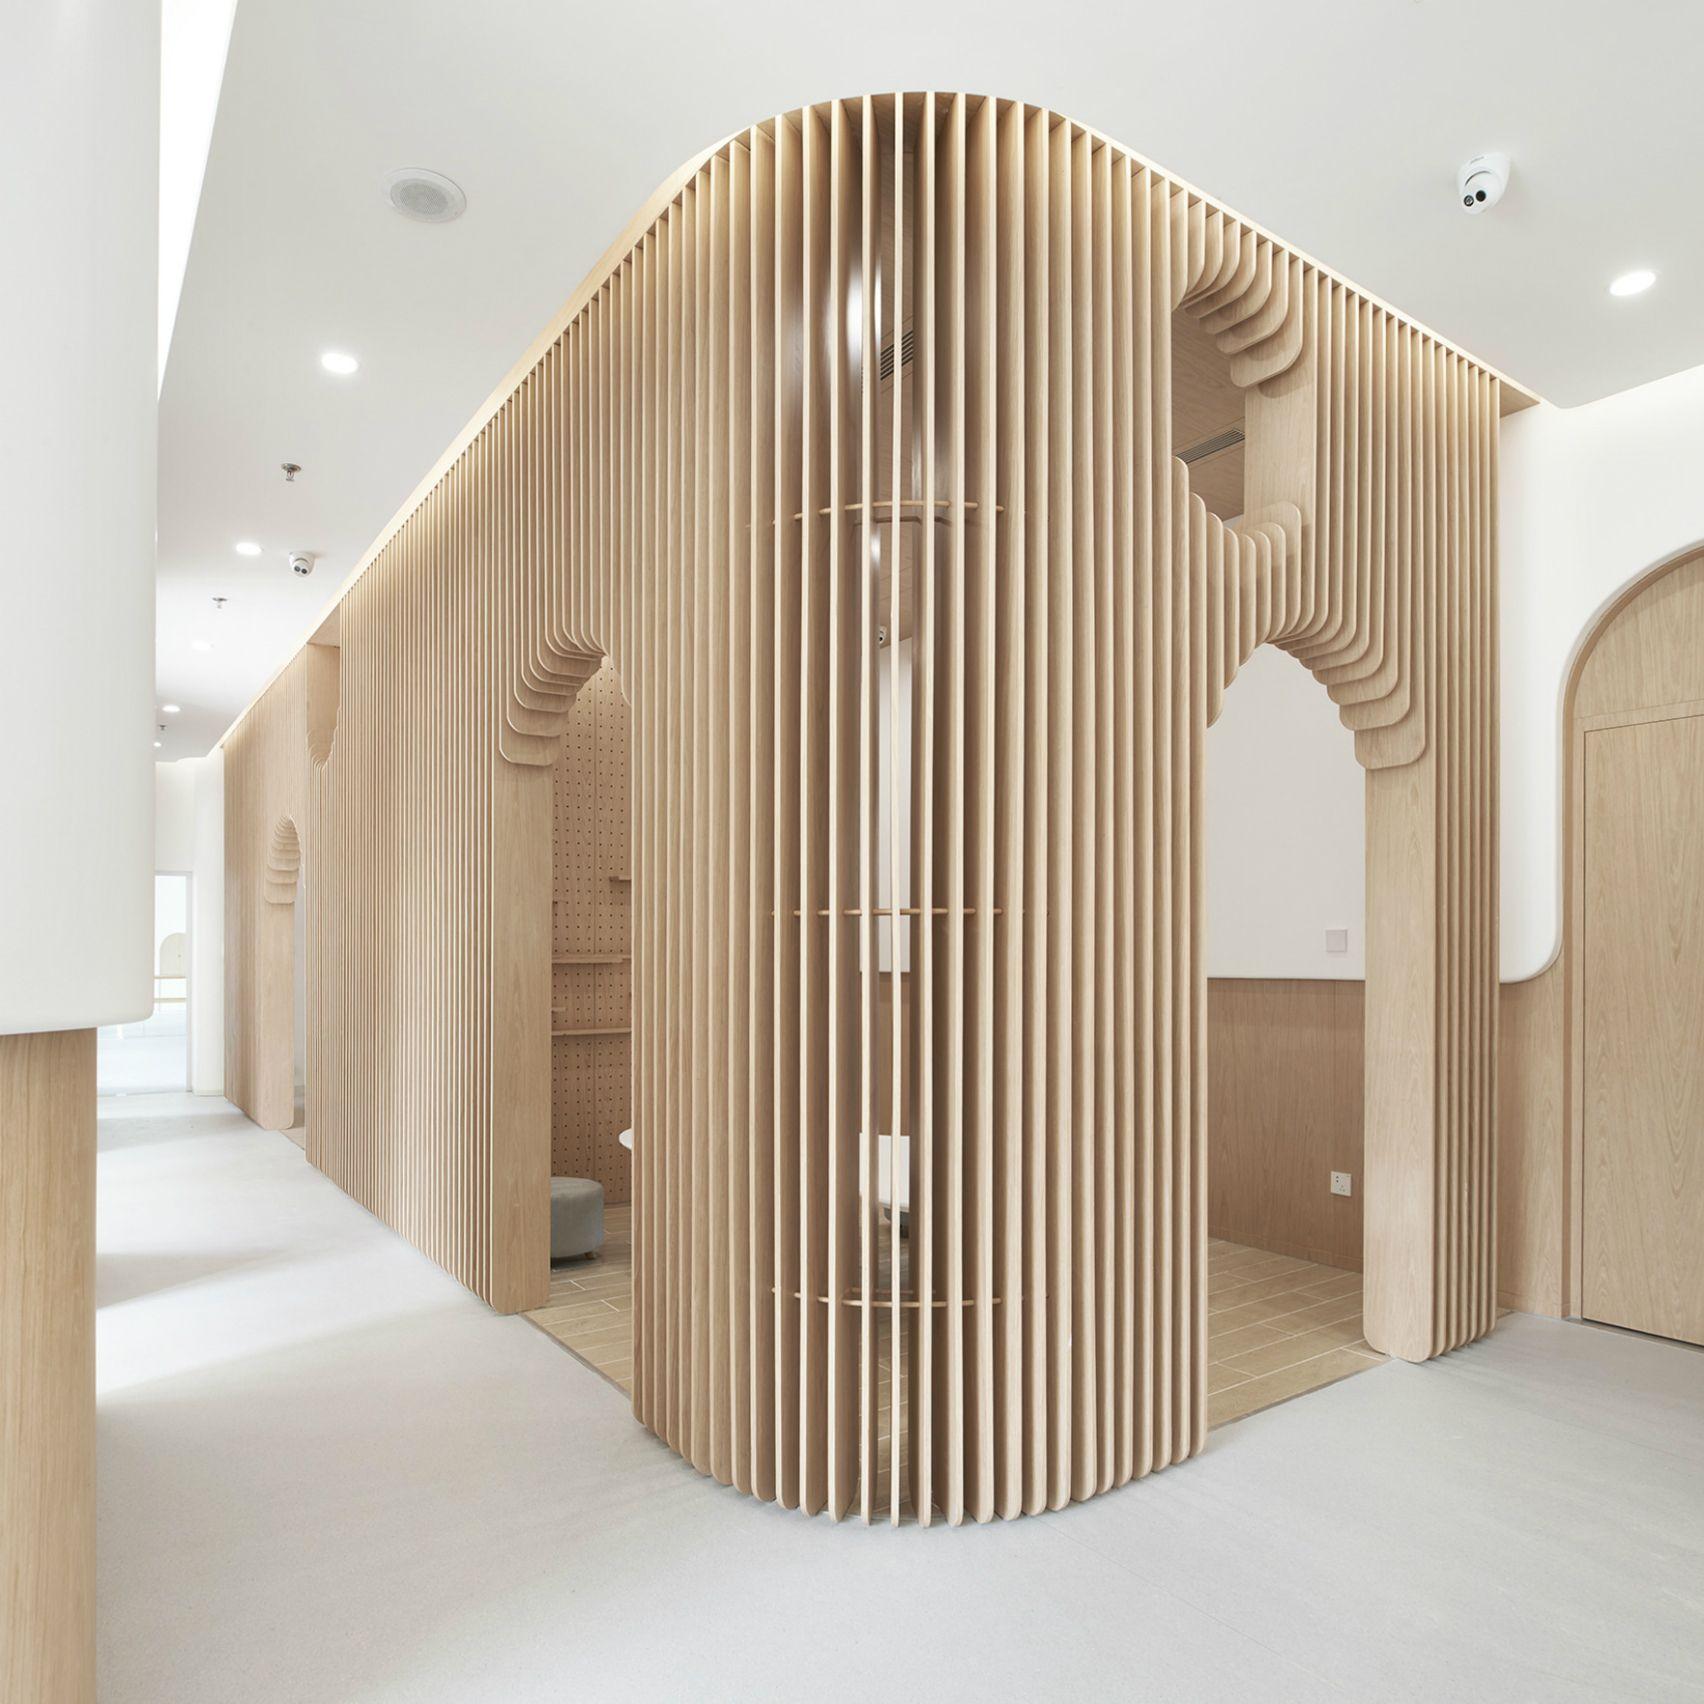 Interior Design Directory: Dezeen Awards 2018 Interior Design Longlist Revealed